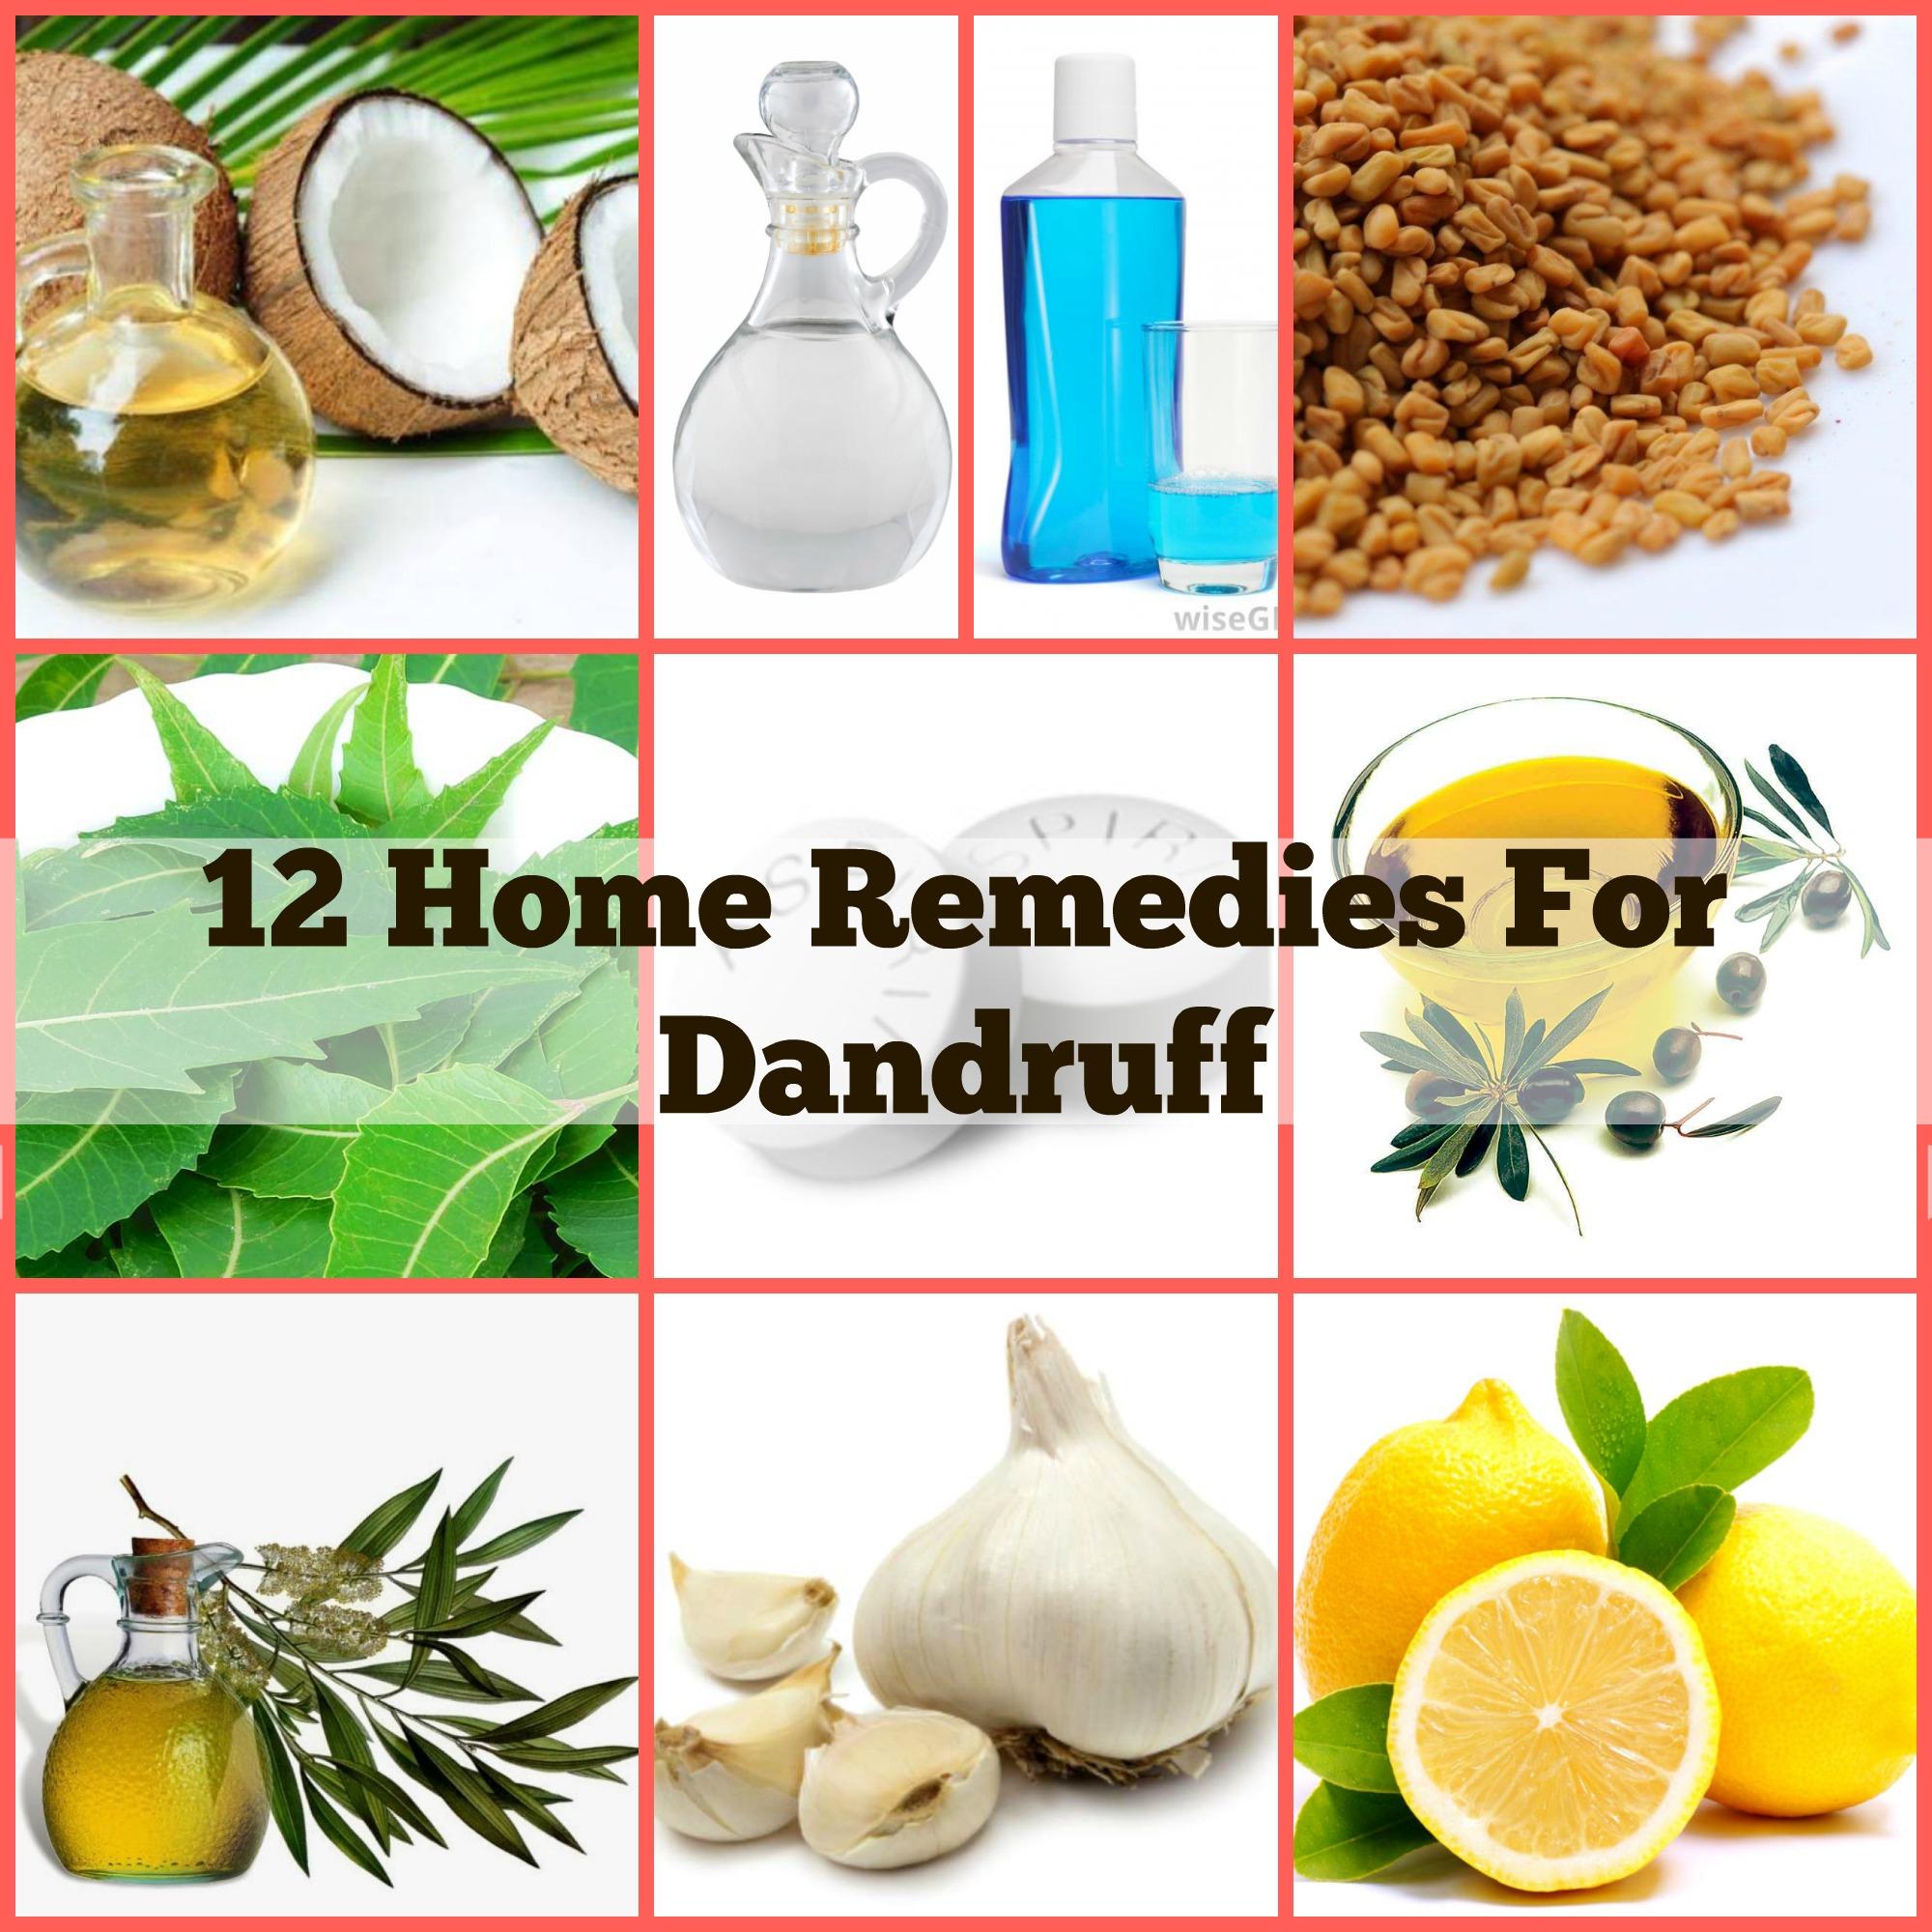 dandruff remedies makeupandbody blog